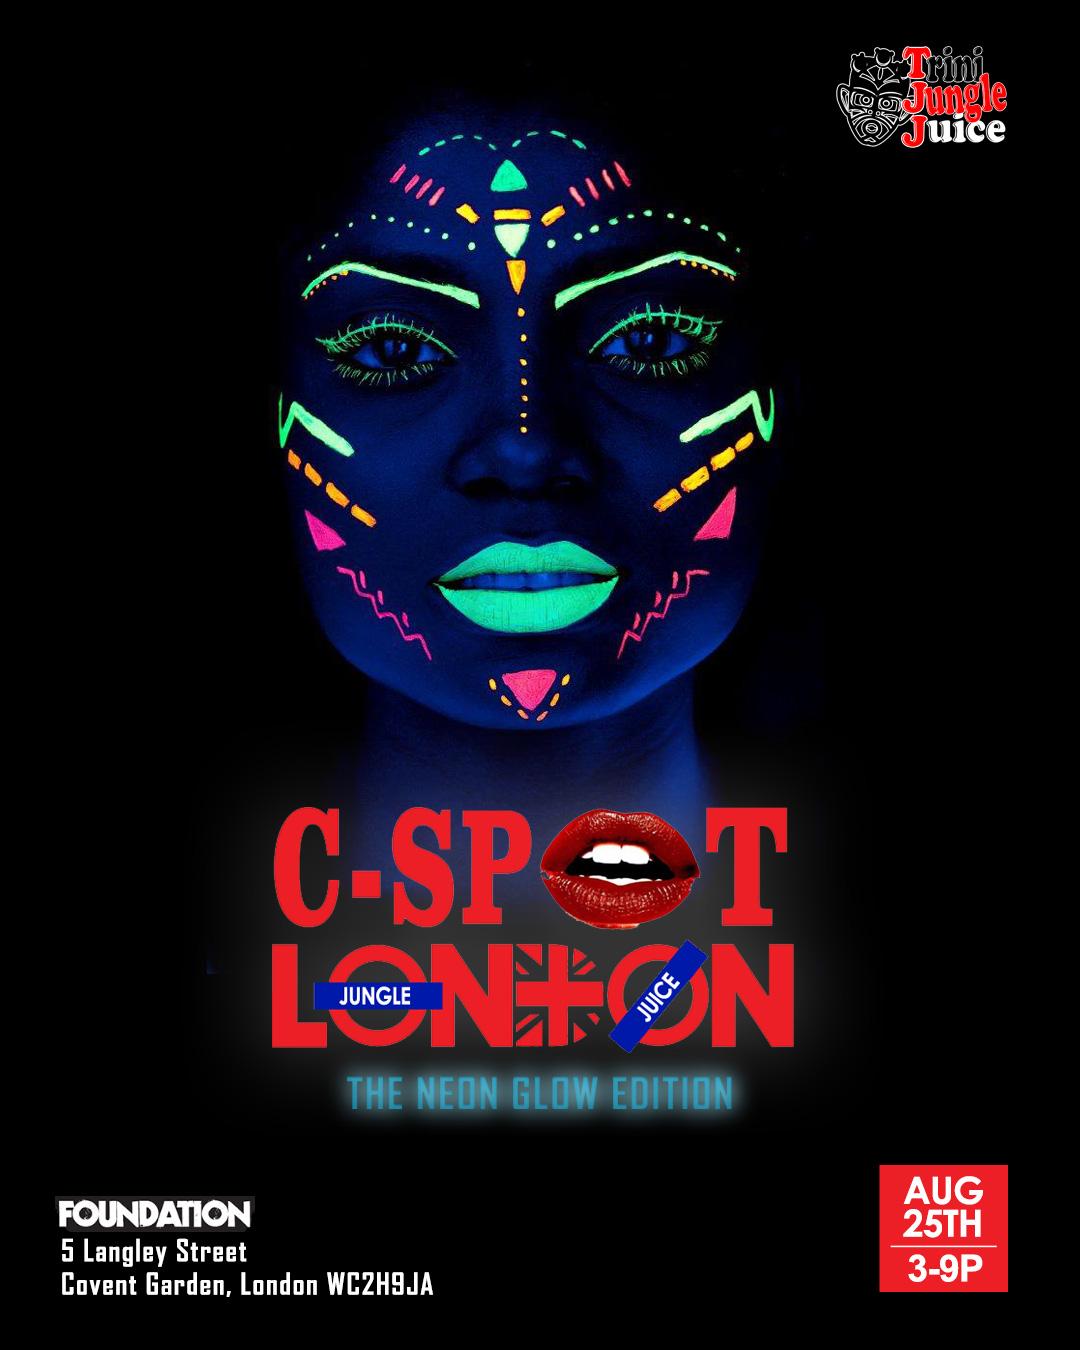 Trini Jungle Juice: C-SPOT 2018 - The Neon Glow Edition